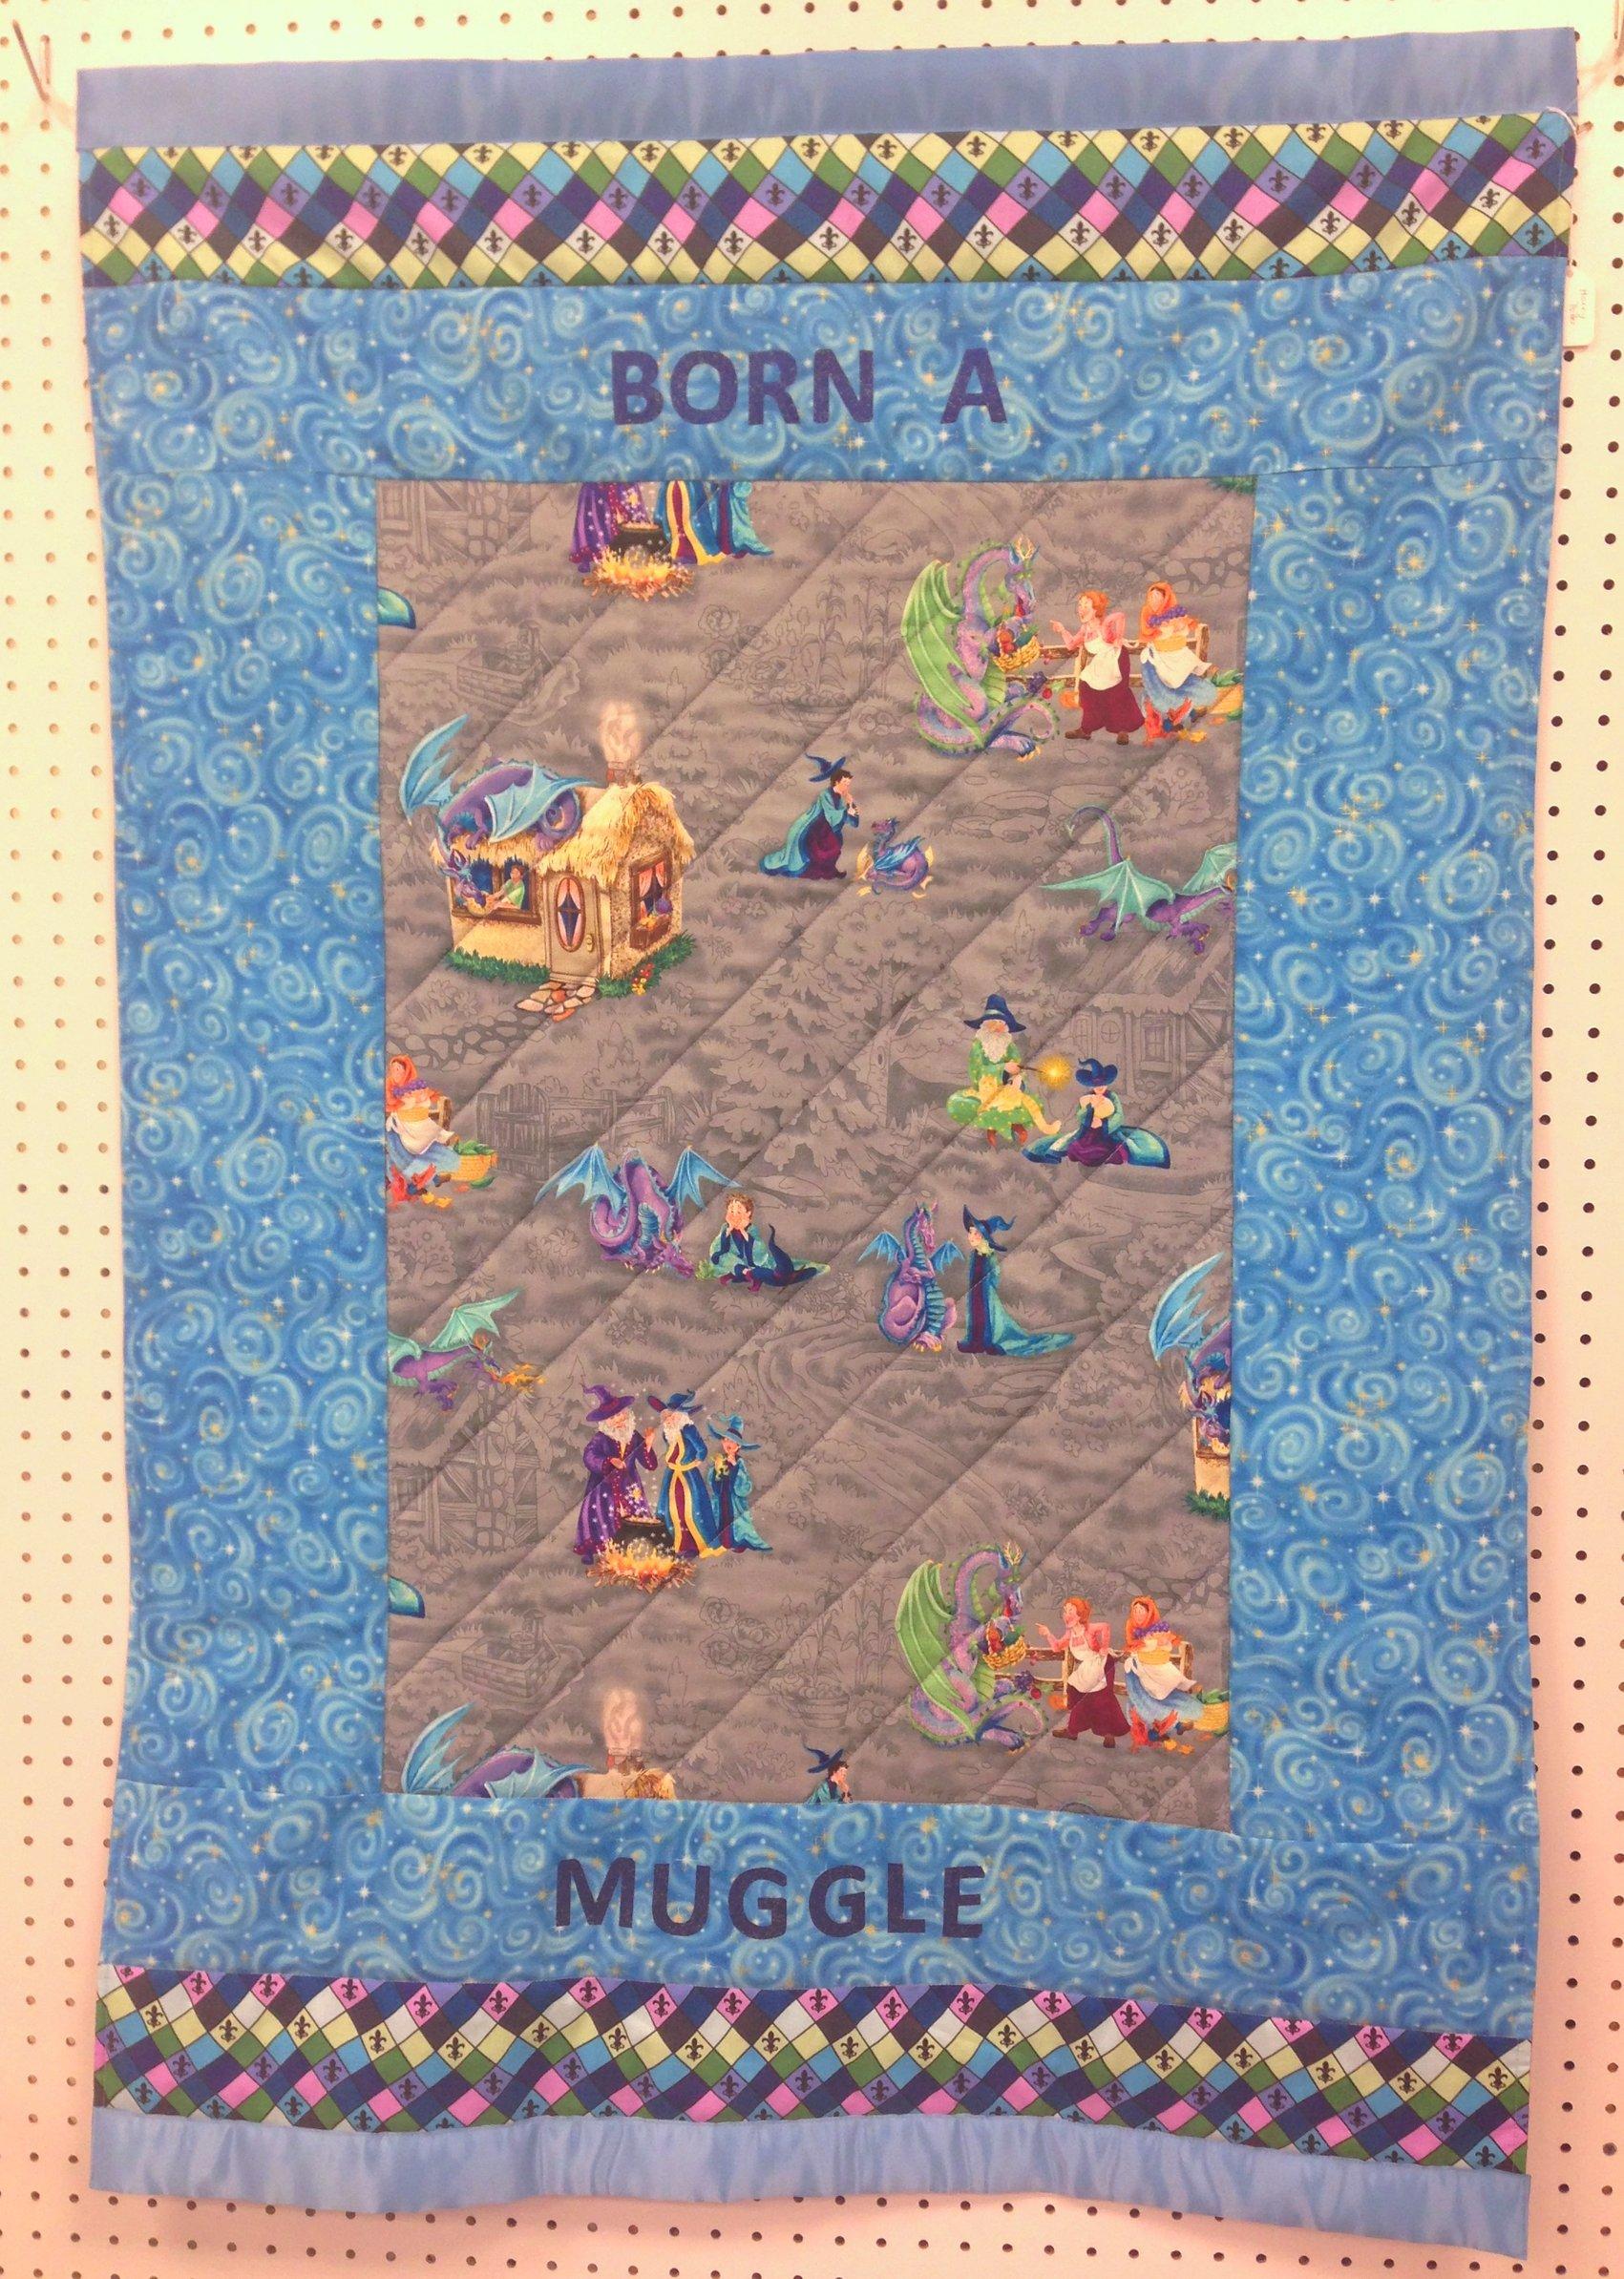 Born a Muggle crib quilt (blue)